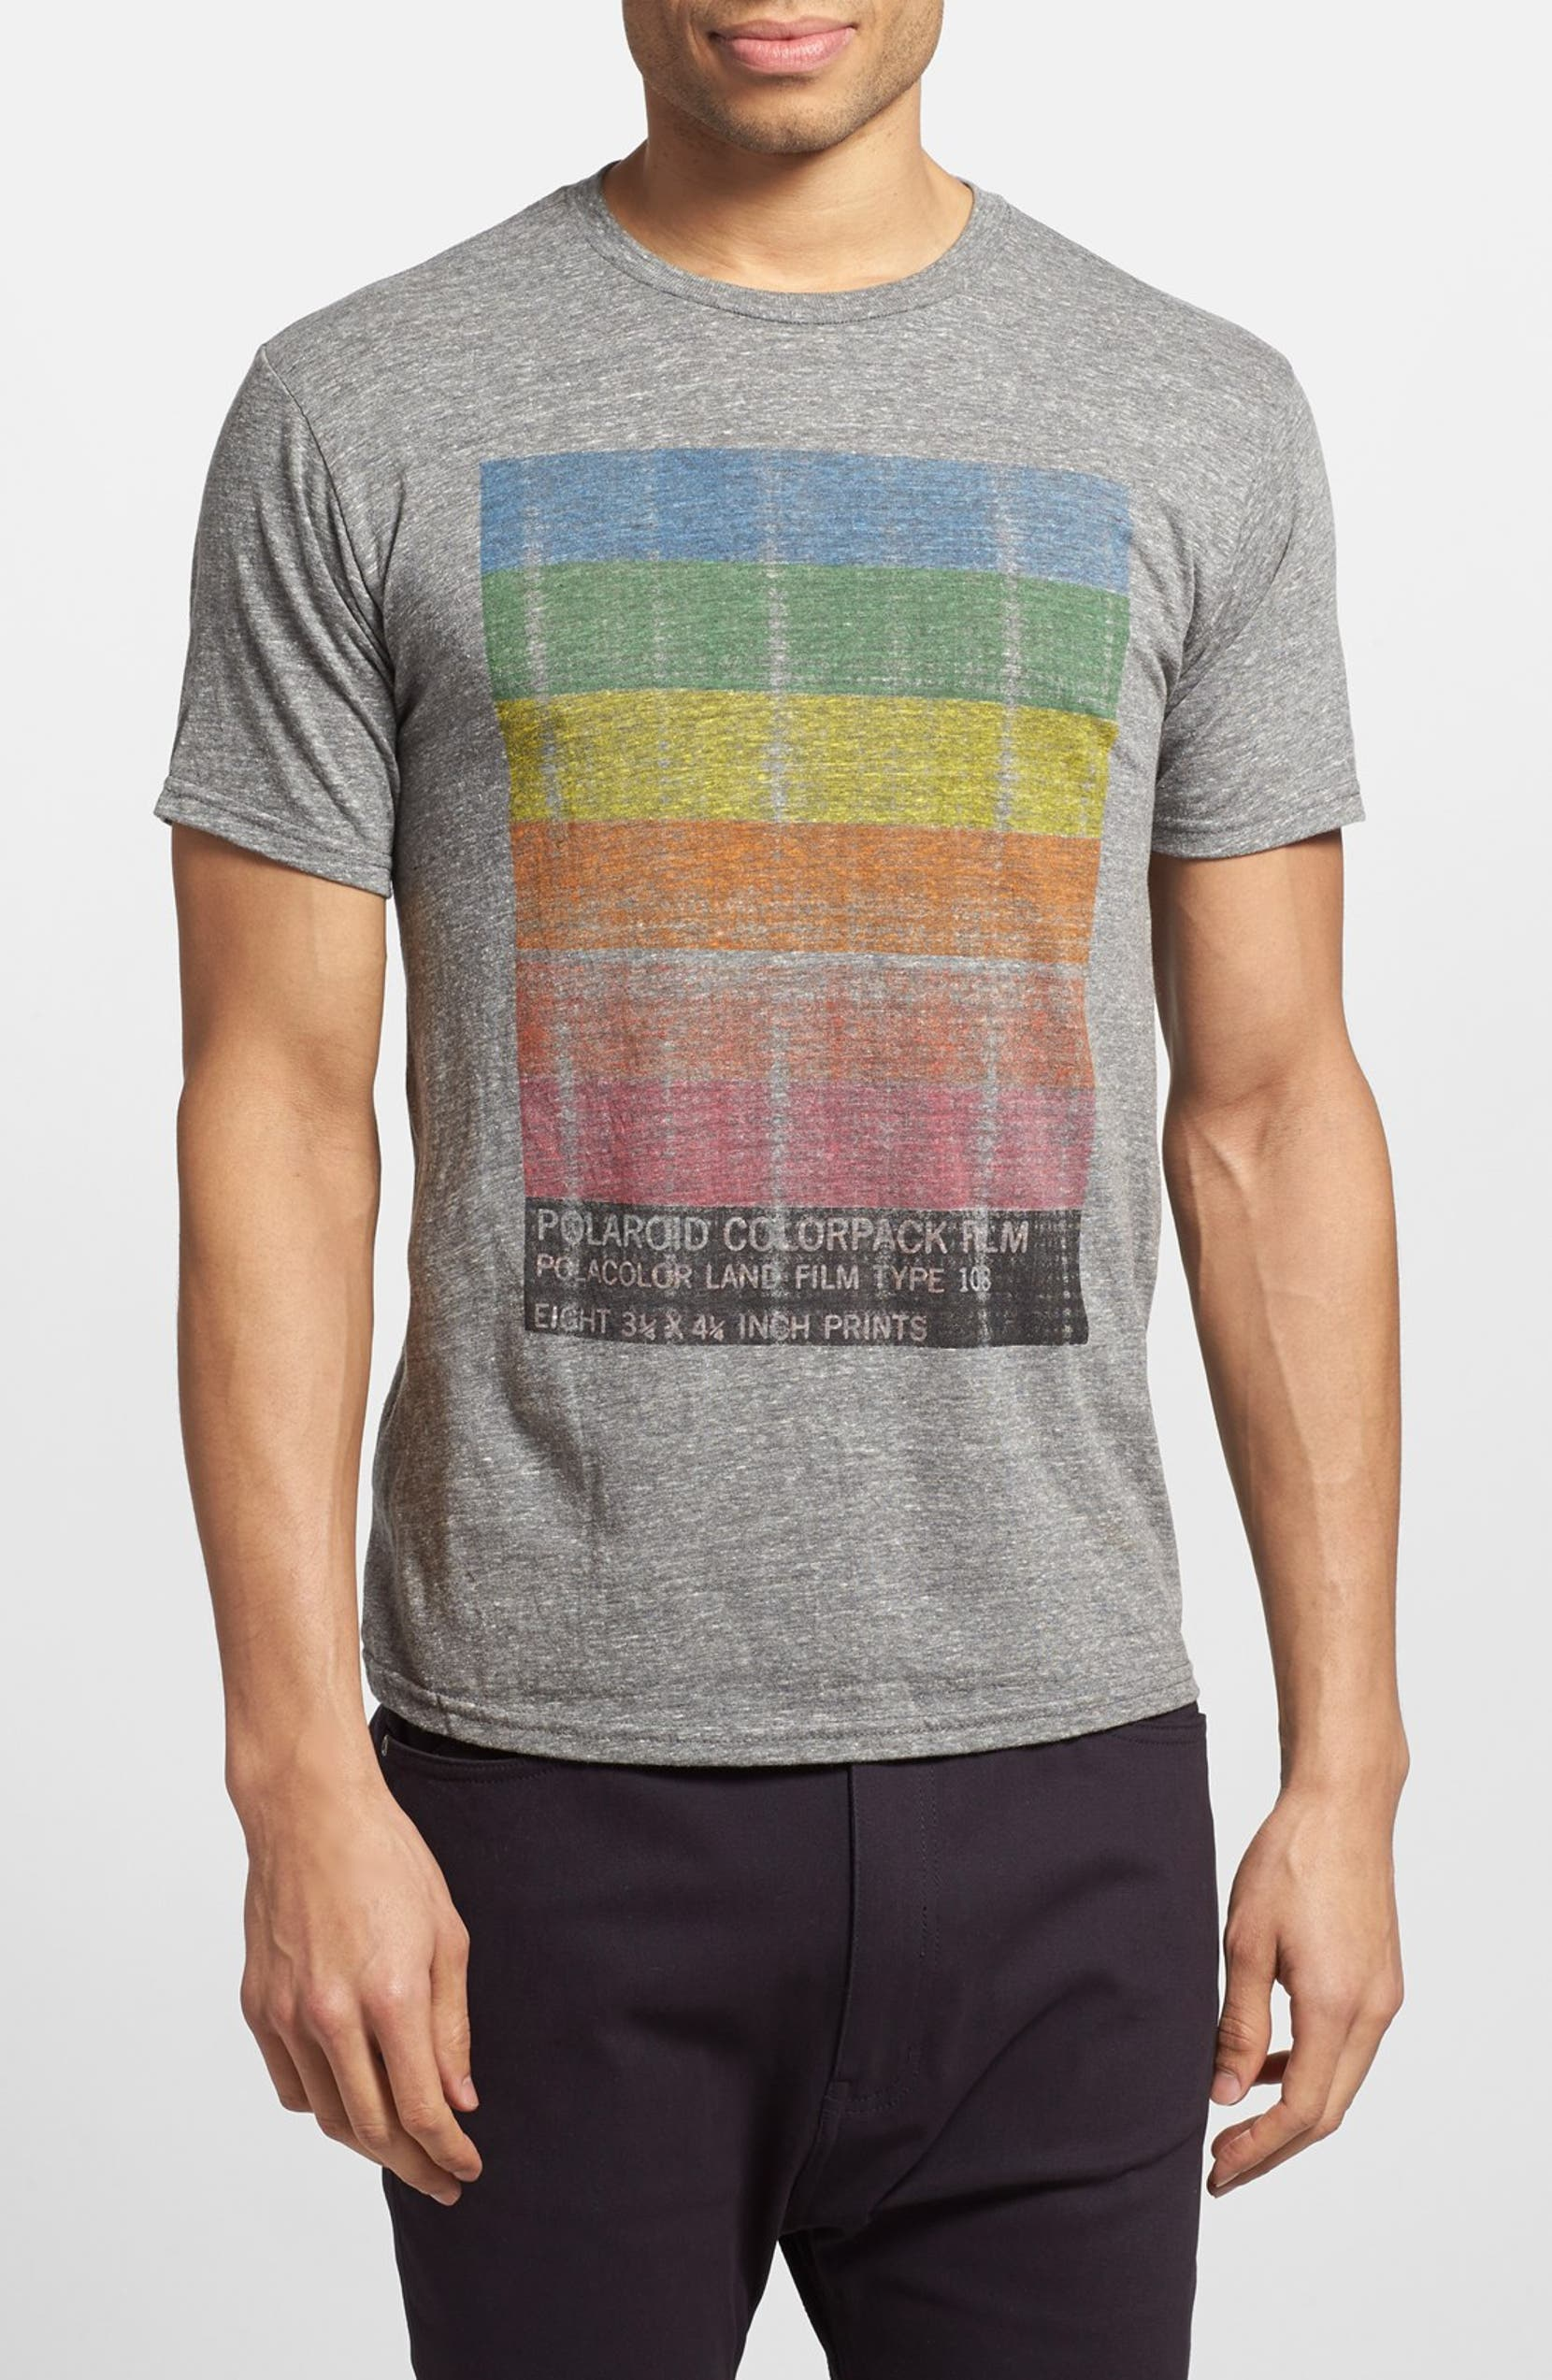 Altru 'Polaroid® Colorpack' Graphic T-Shirt | Nordstrom